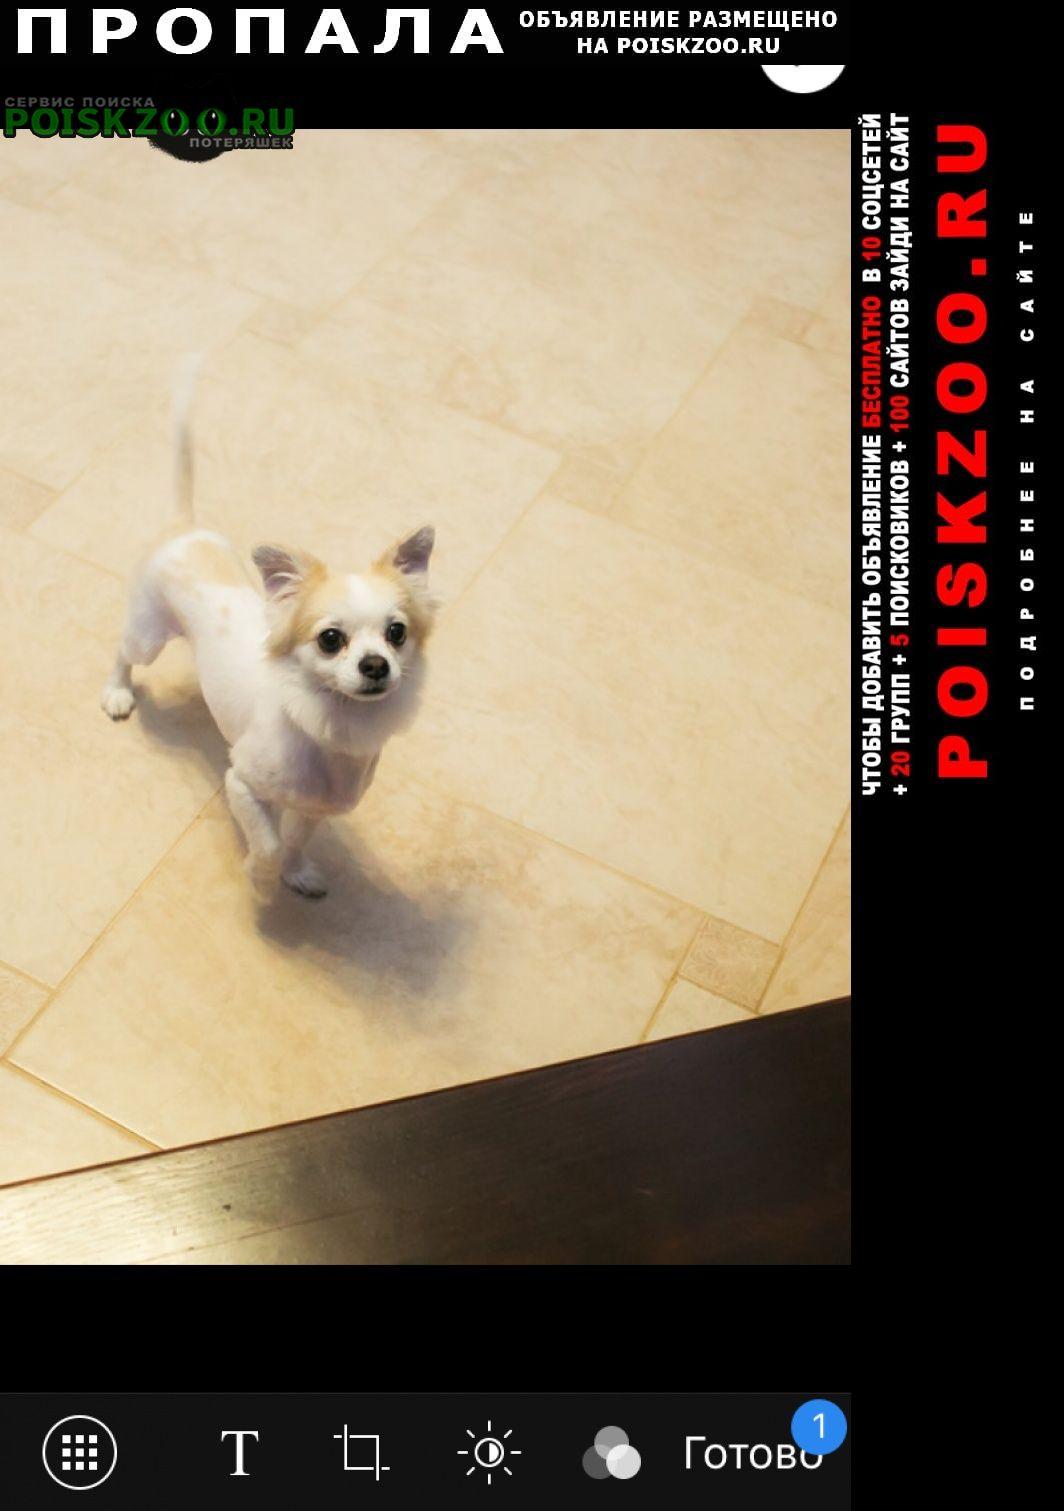 Пропала собака кобель Зеленогорск (Красноярский край)